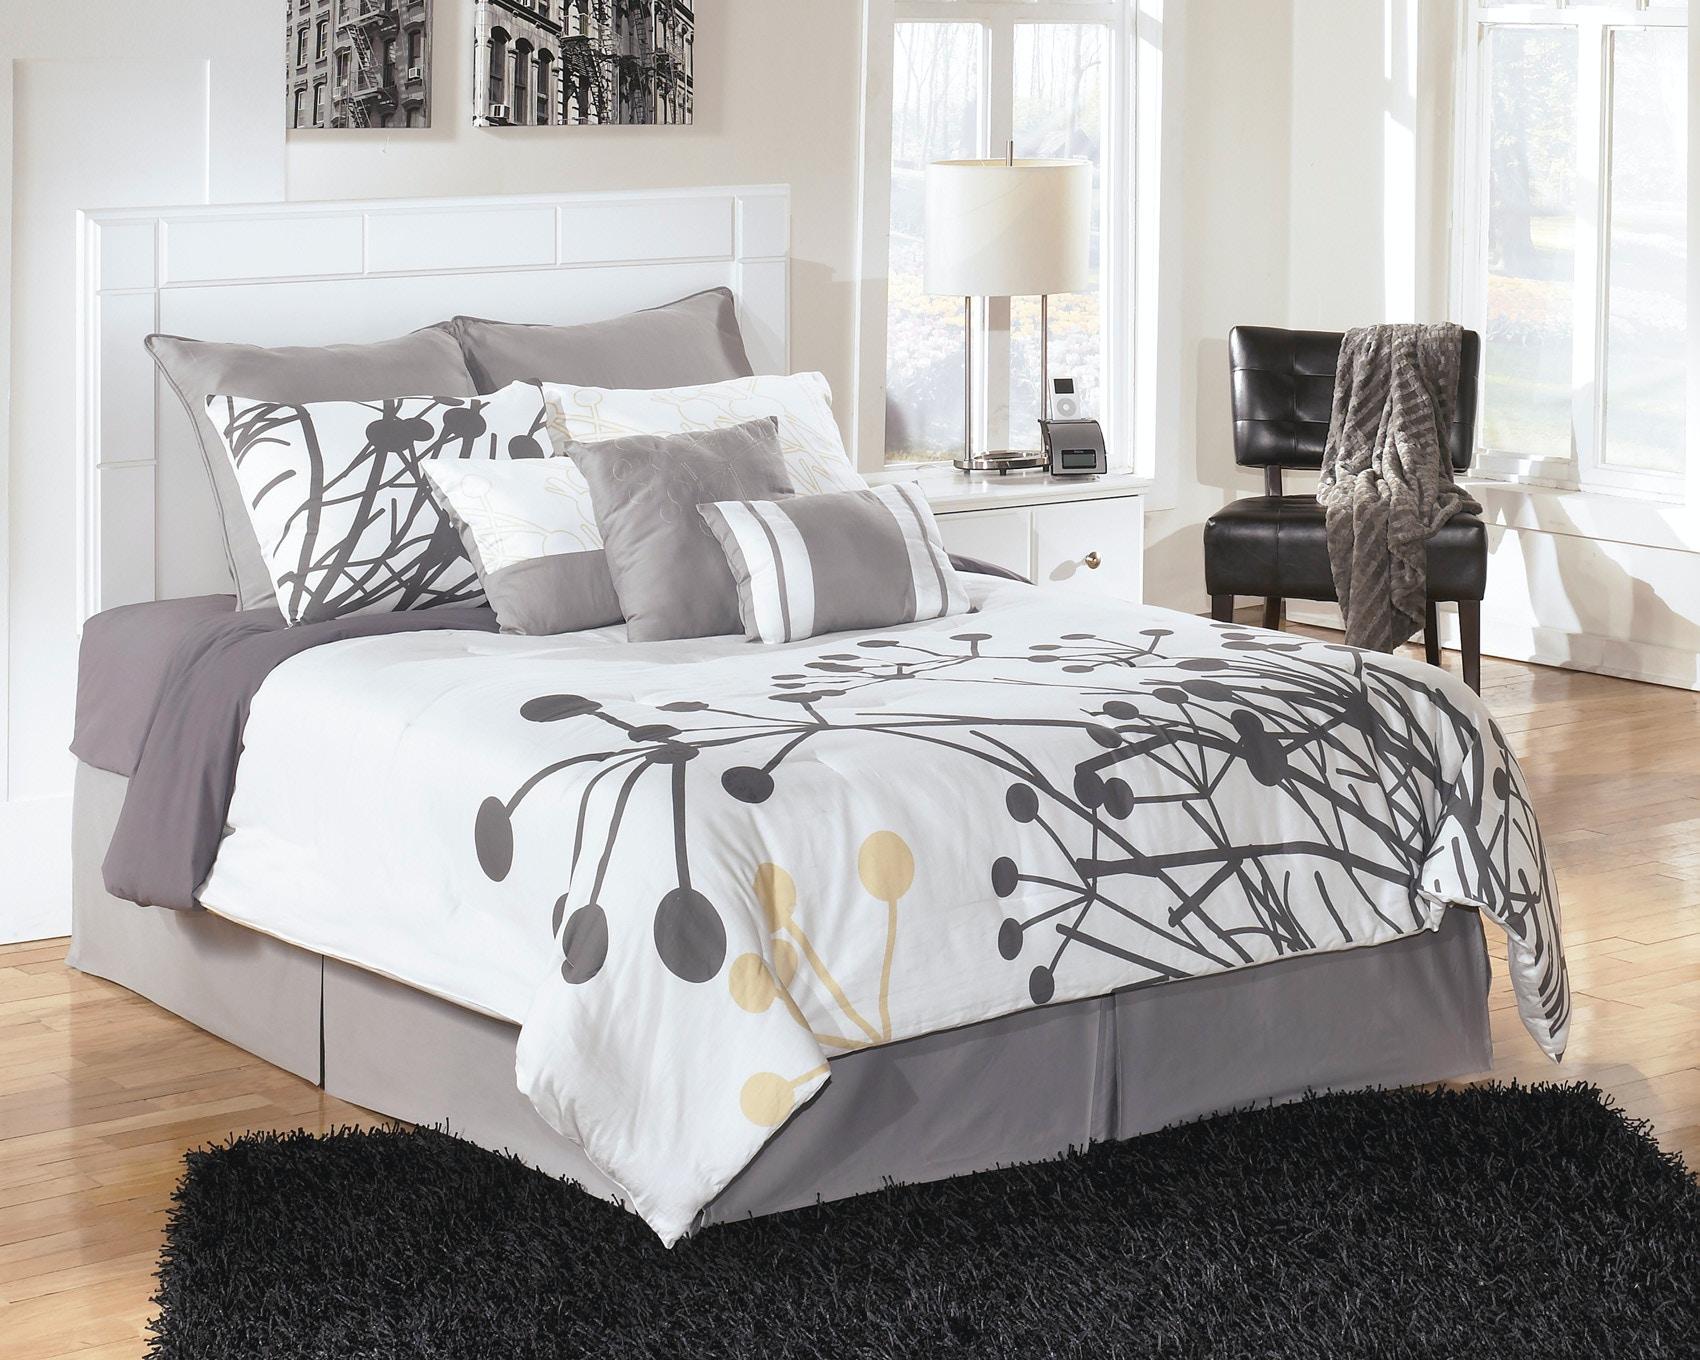 Signature Design by Ashley Bedroom Weeki Panel Headboard - Queen 036779 - Furniture Fair ...